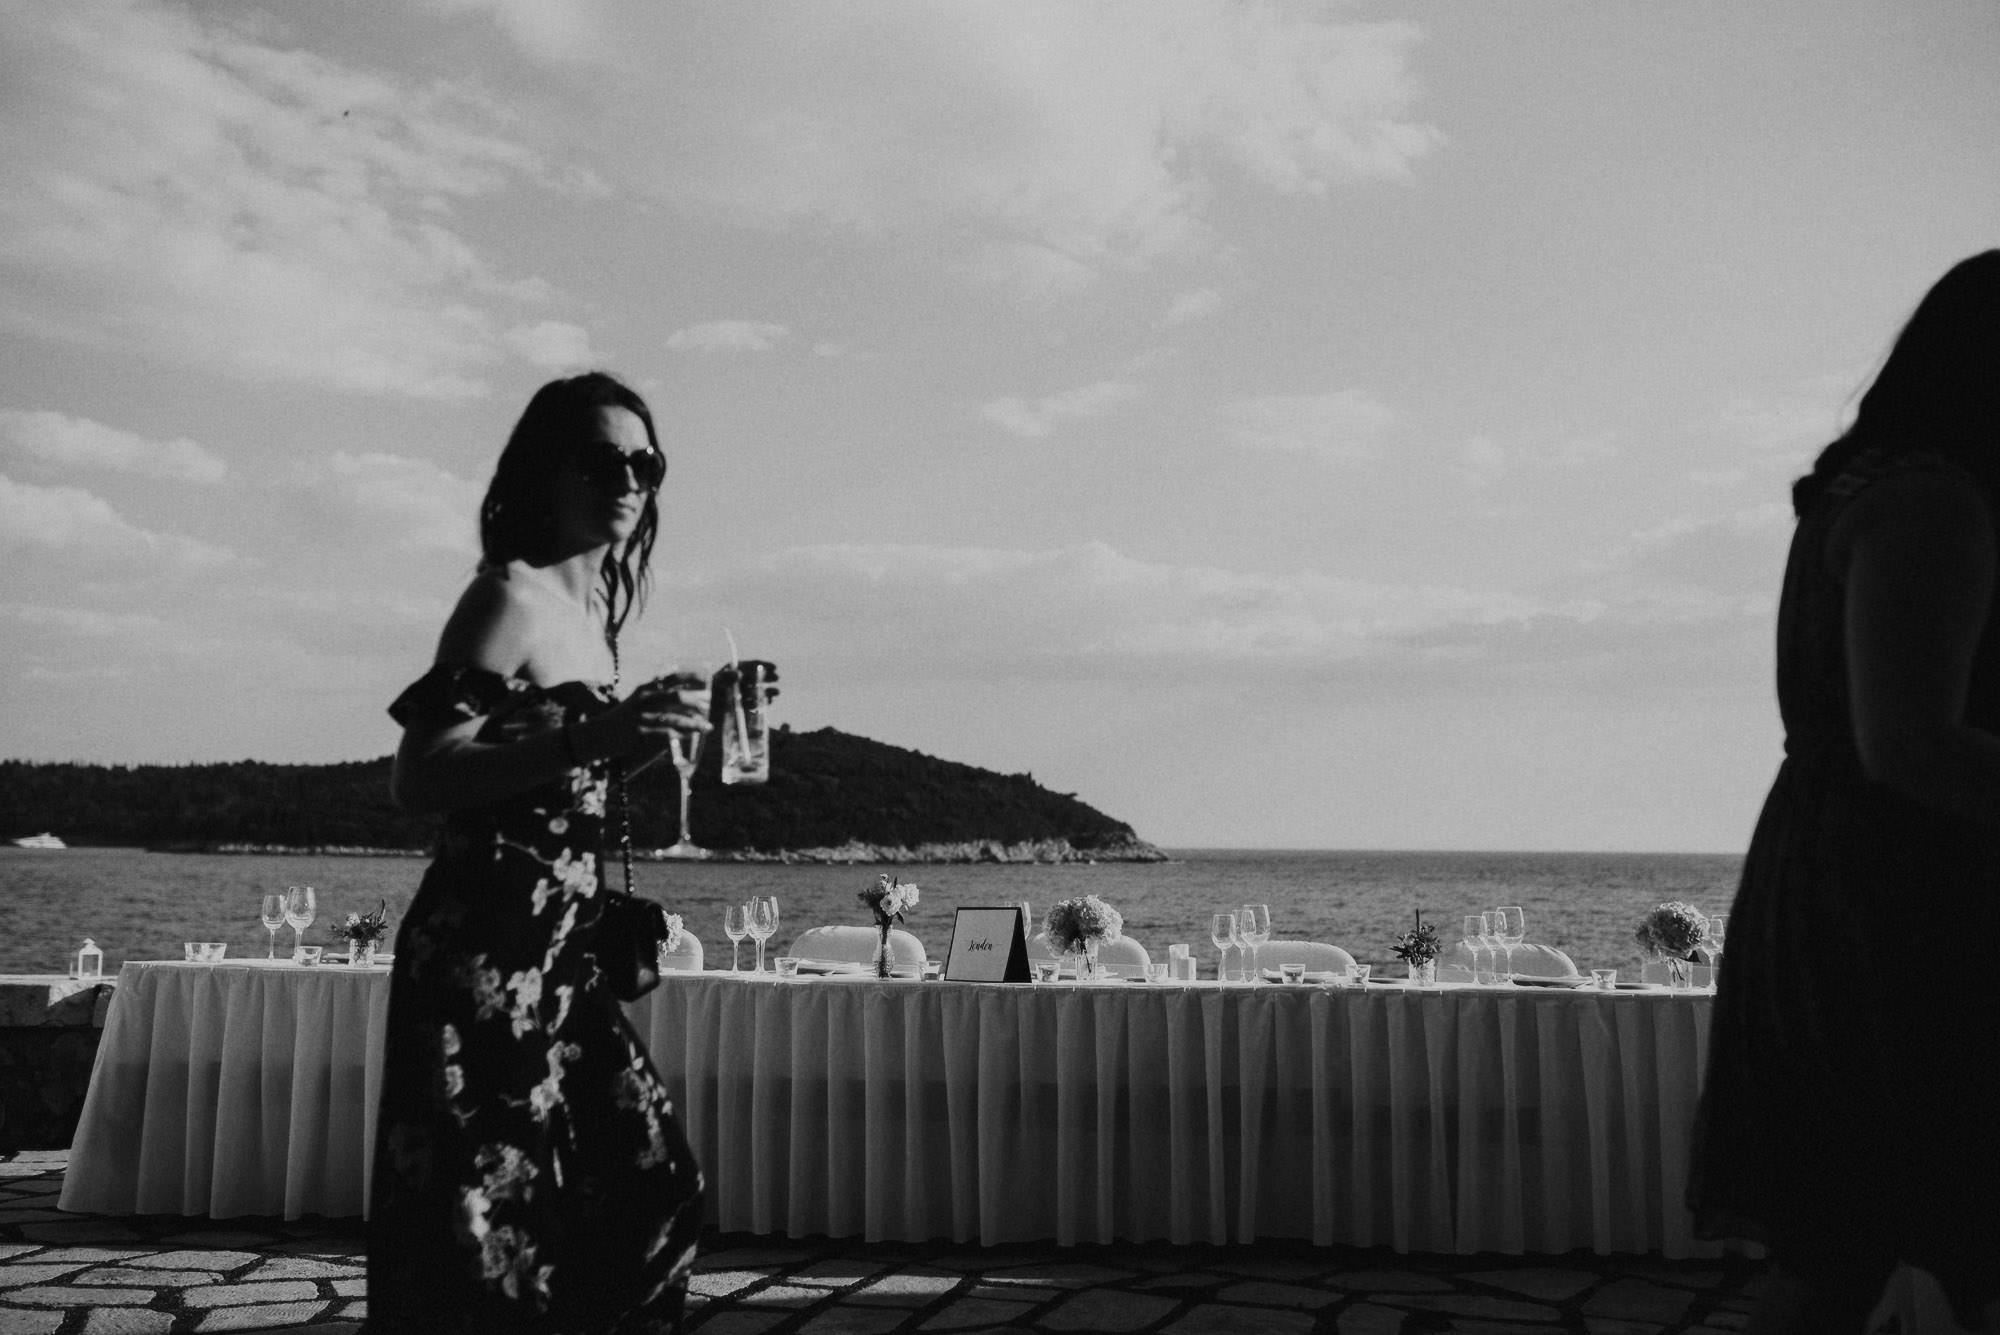 dubrovnik_croatia_wedding_photographer-jere_satamo-destination_weddings-056-web.jpg